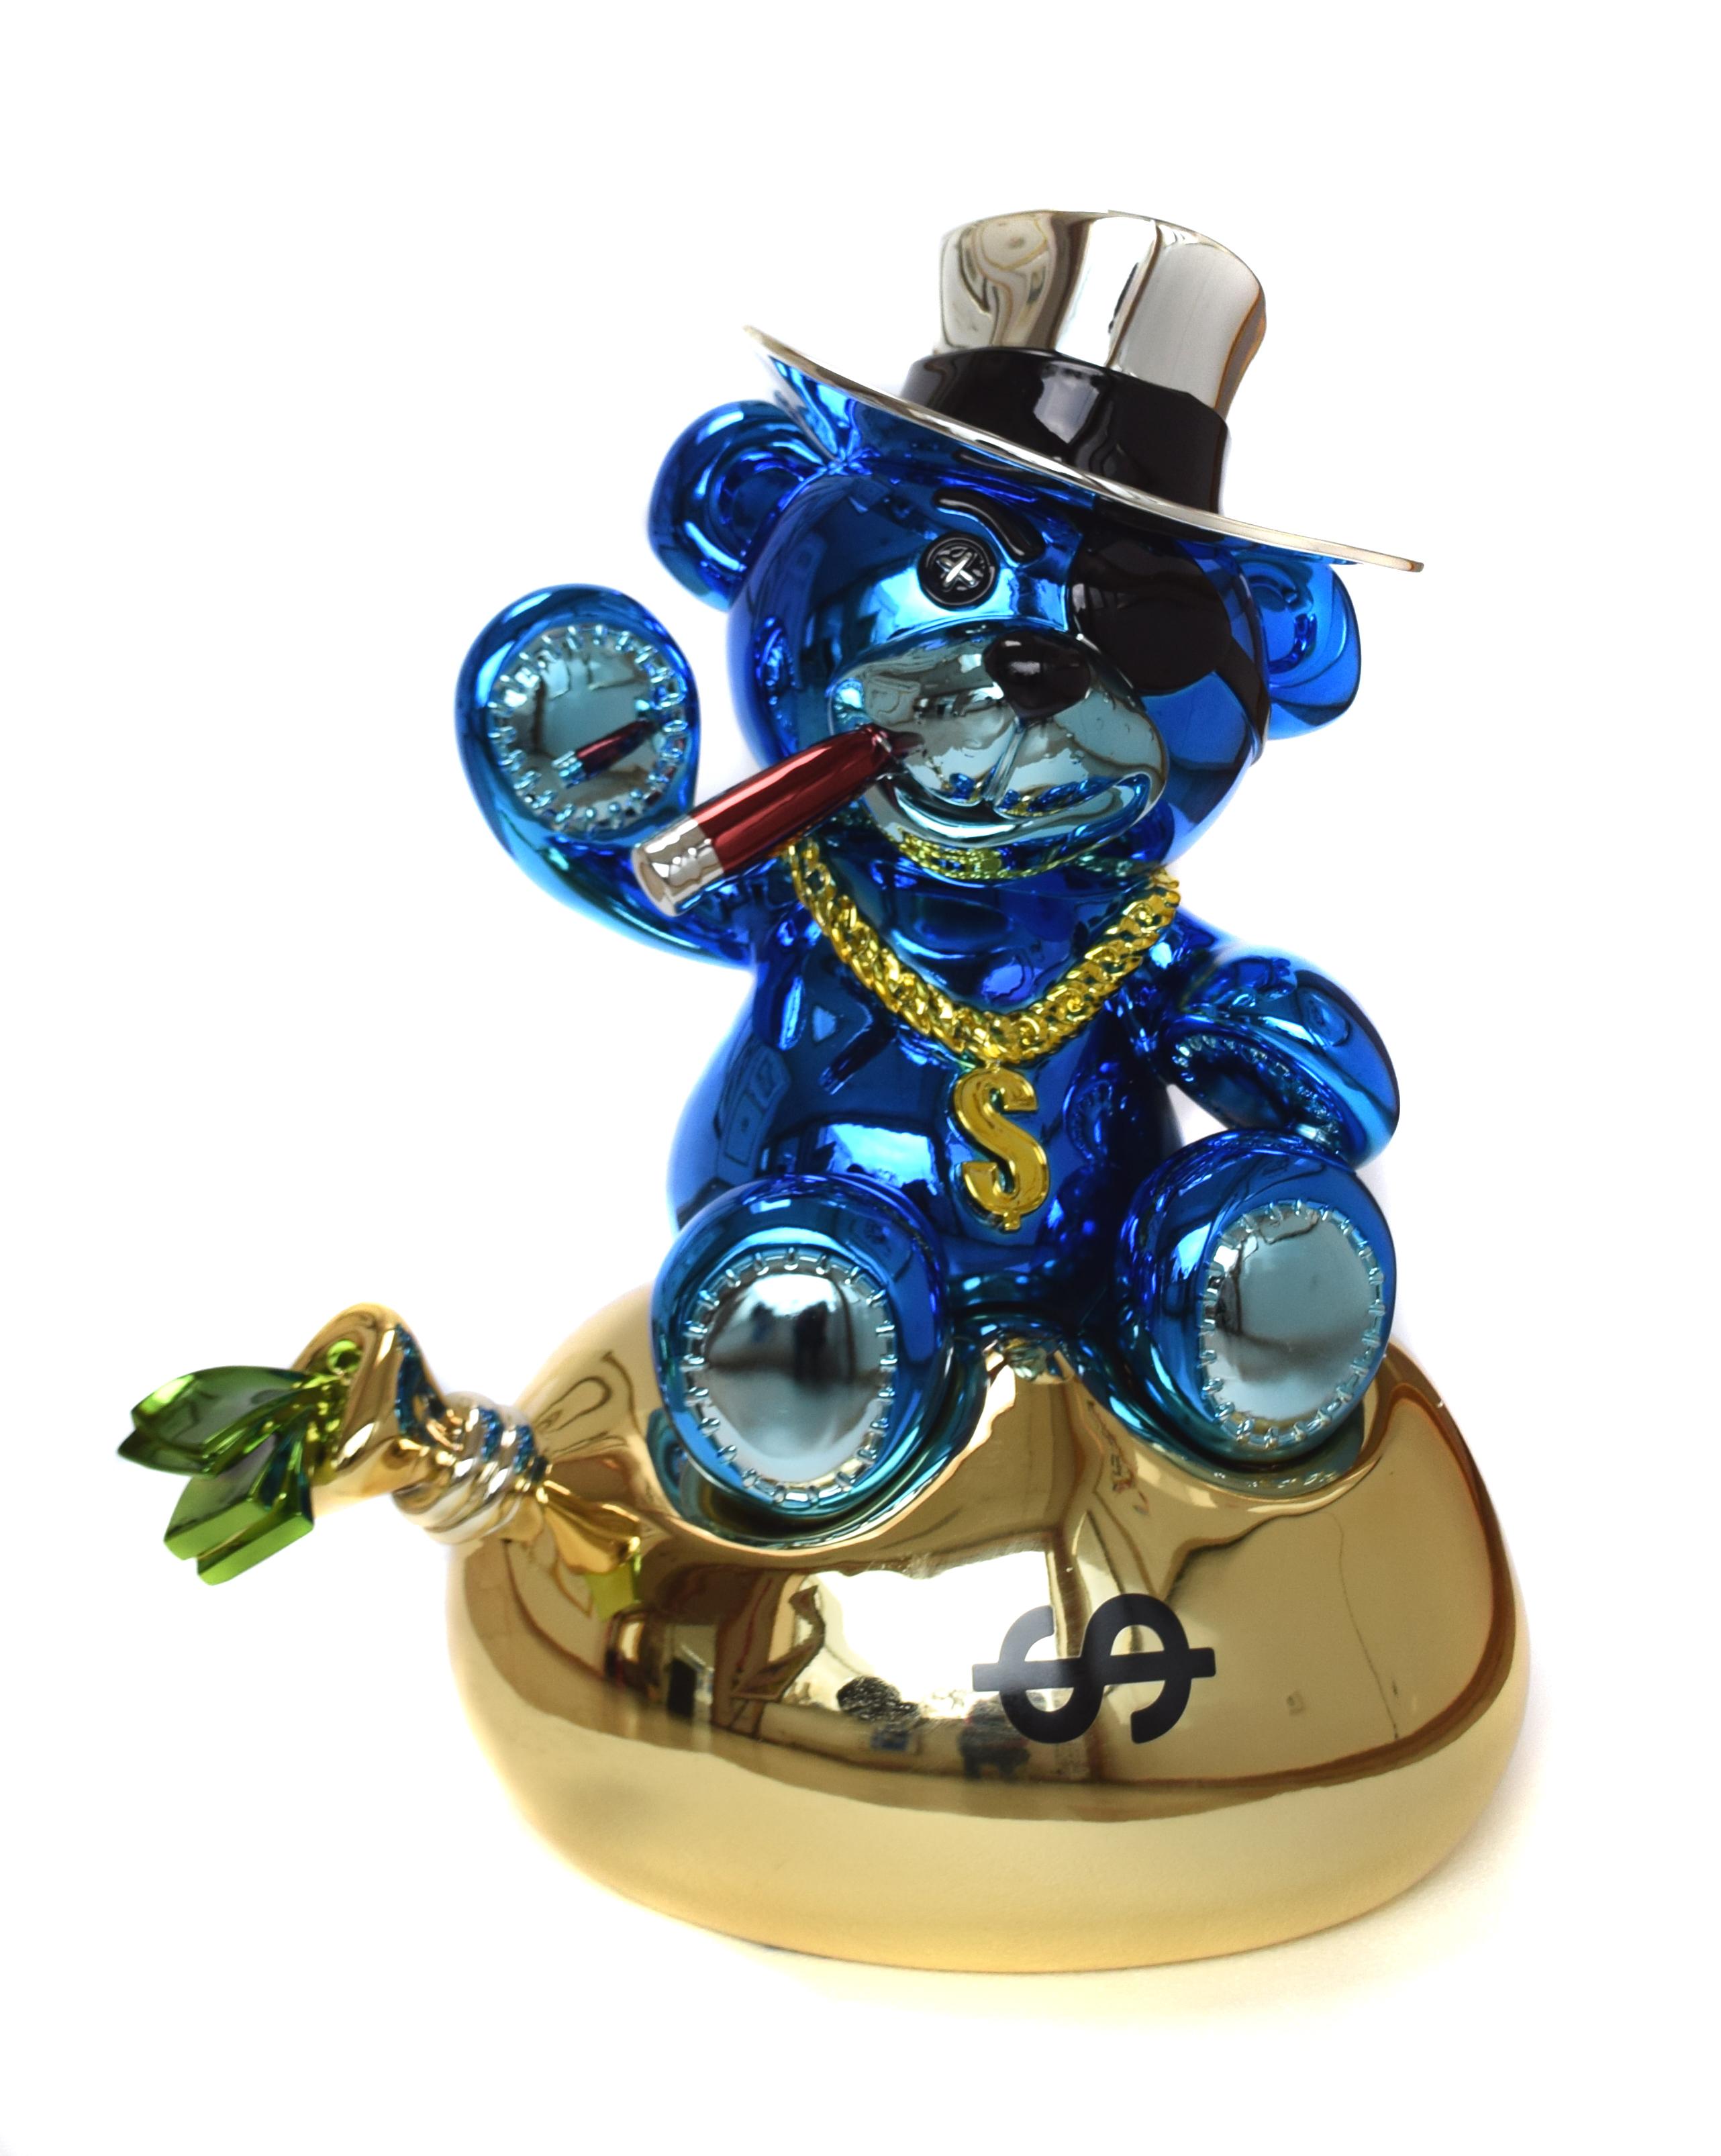 Diederik - Mr. Cohiba Blue , 4504-011-036-045